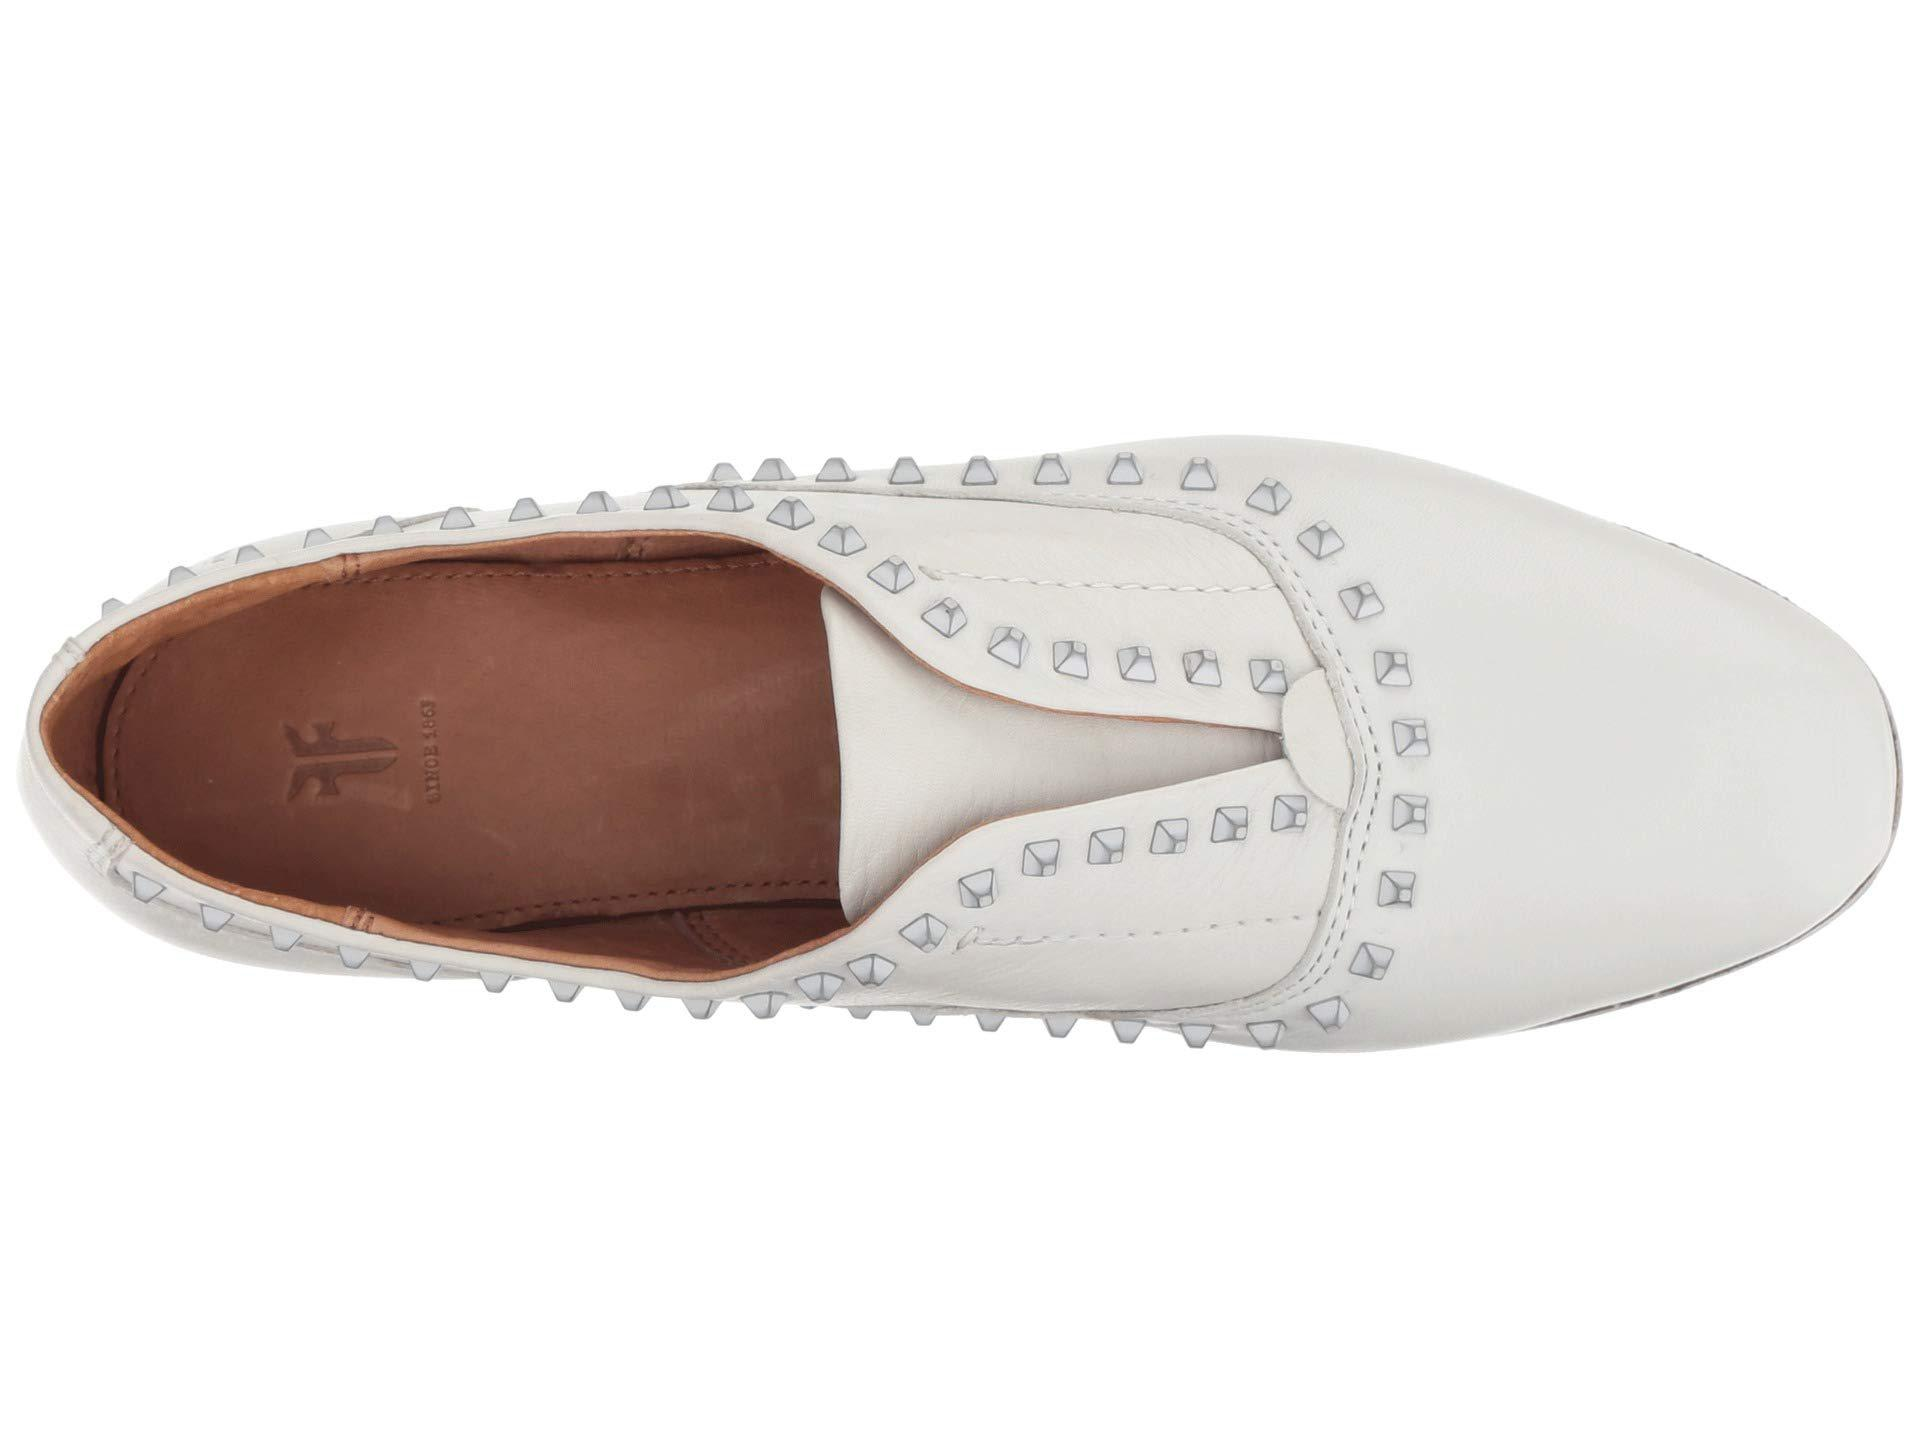 dadf50be349 Lyst - Frye Terri Deco Stud Slip-on in White - Save 50%